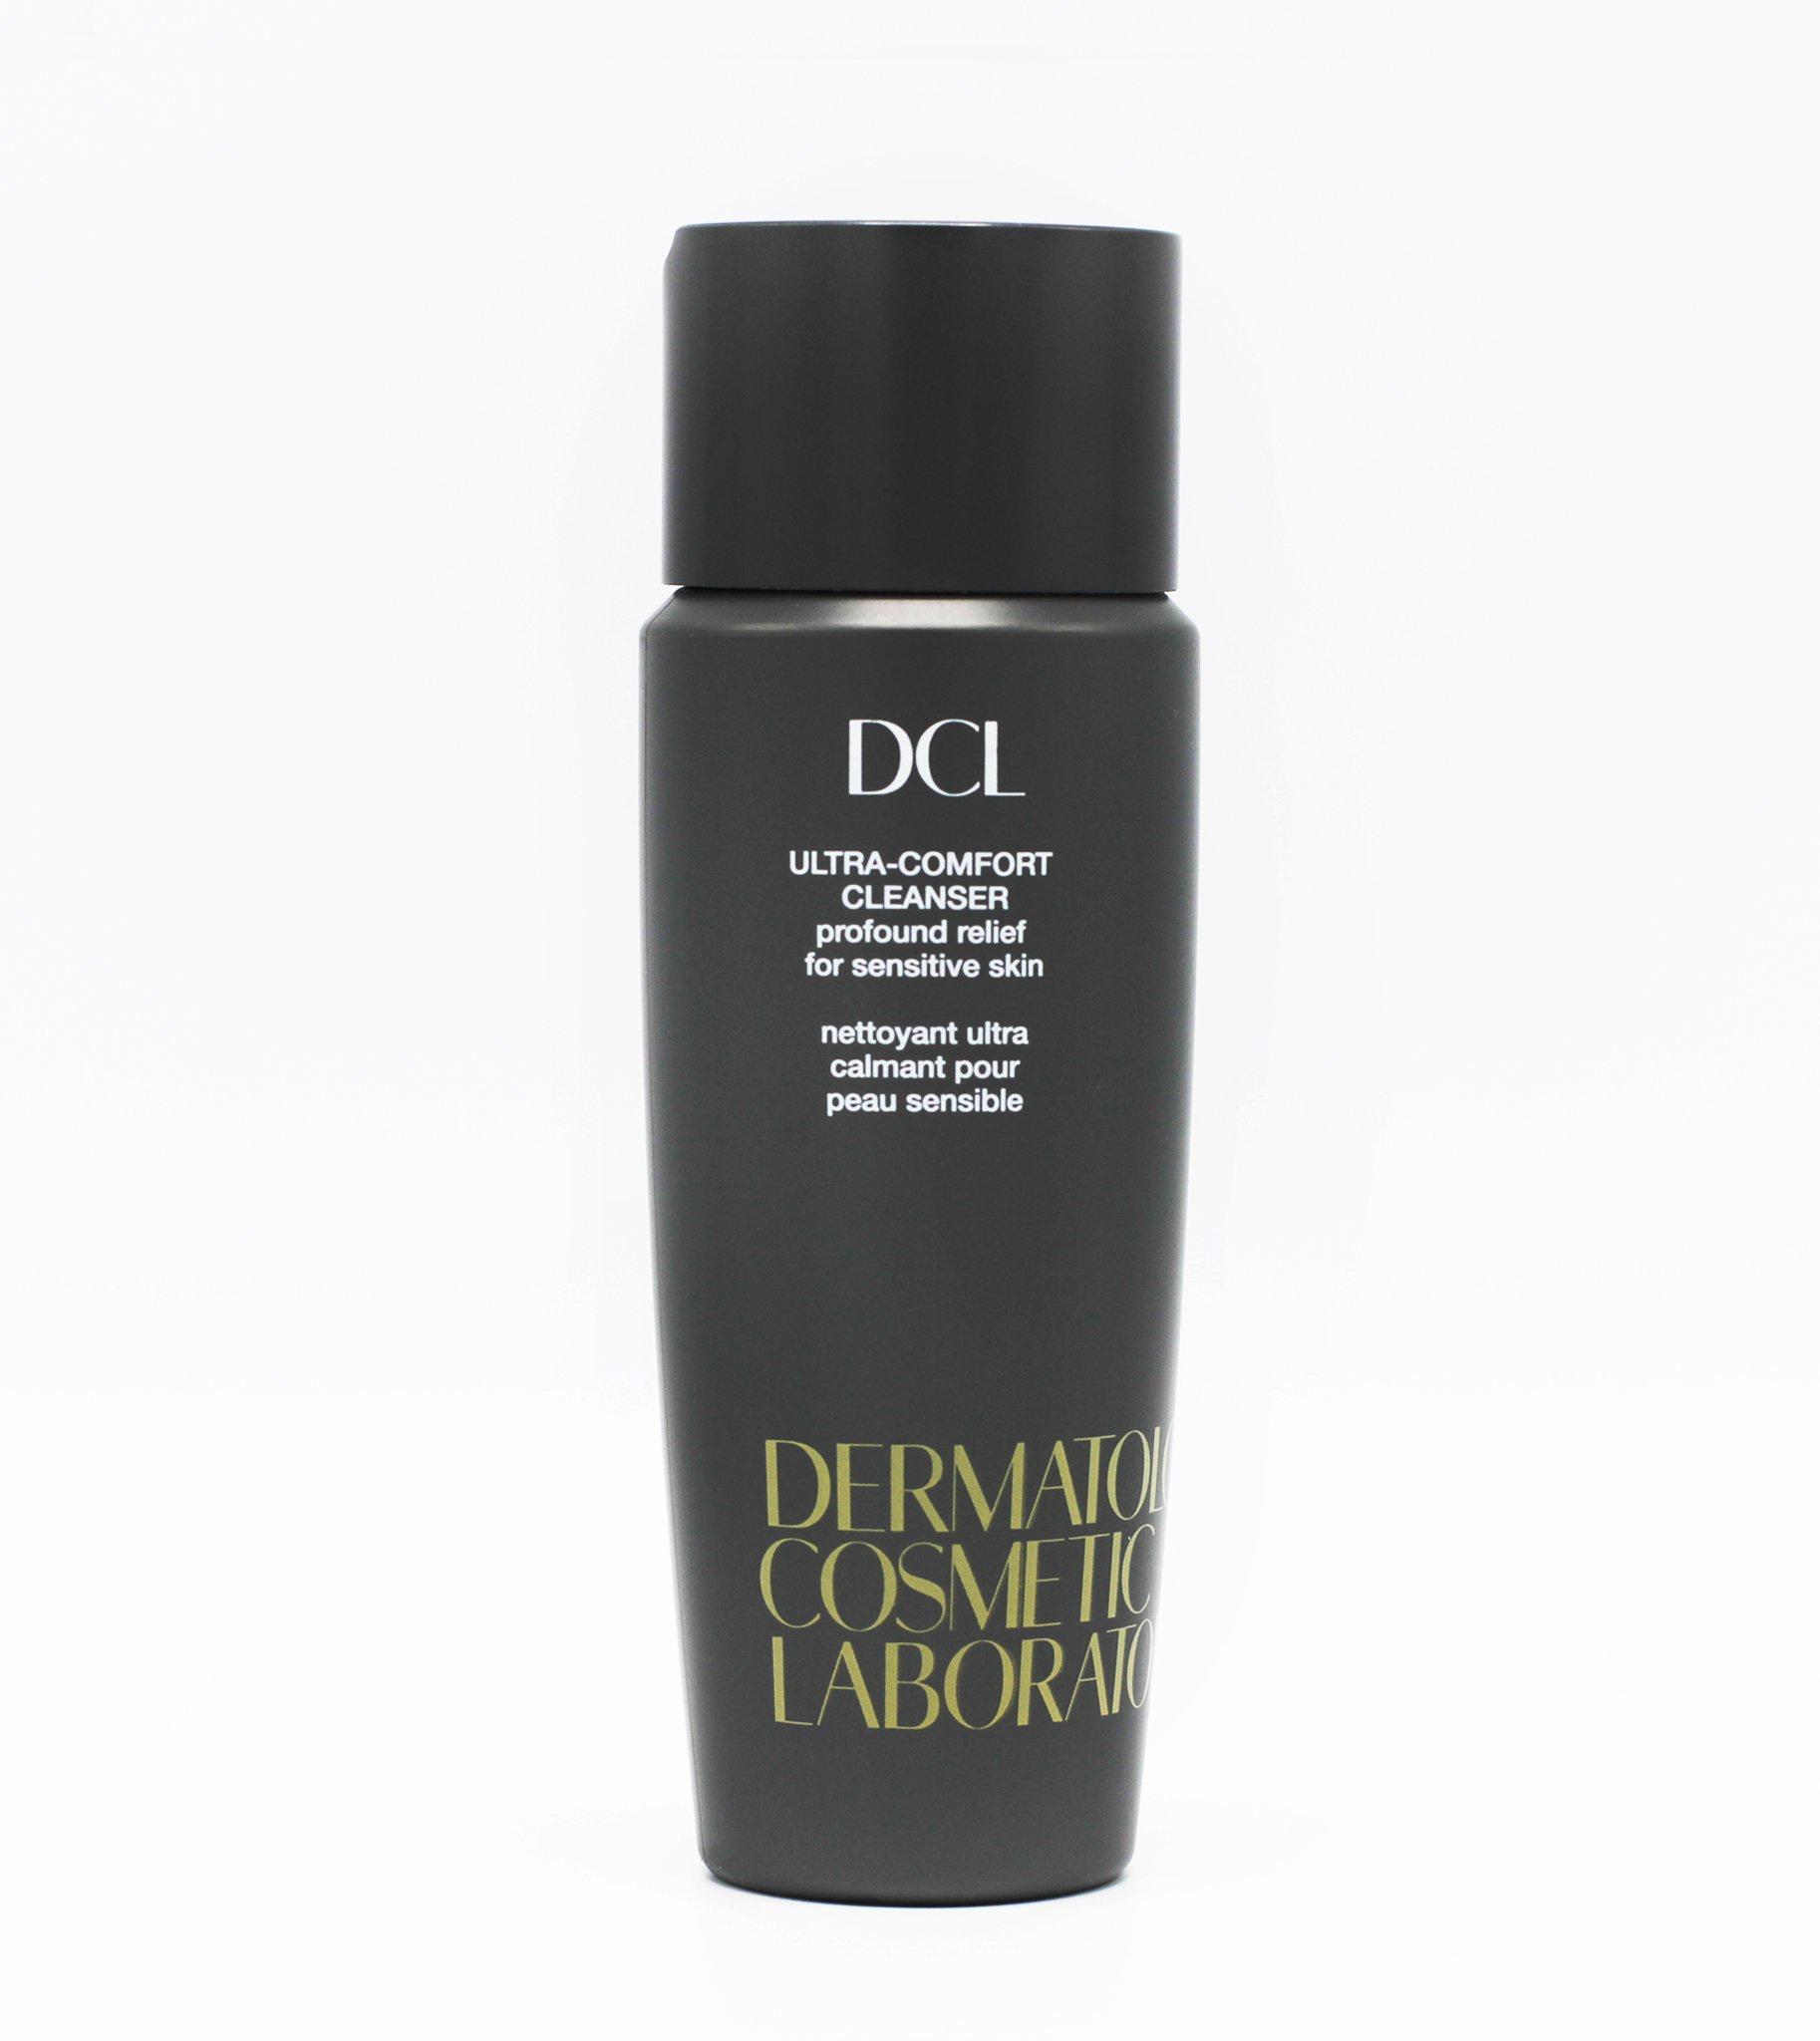 DLC Dermatologic Cosmetic Laboratories Ultra-Comfort Cleanser